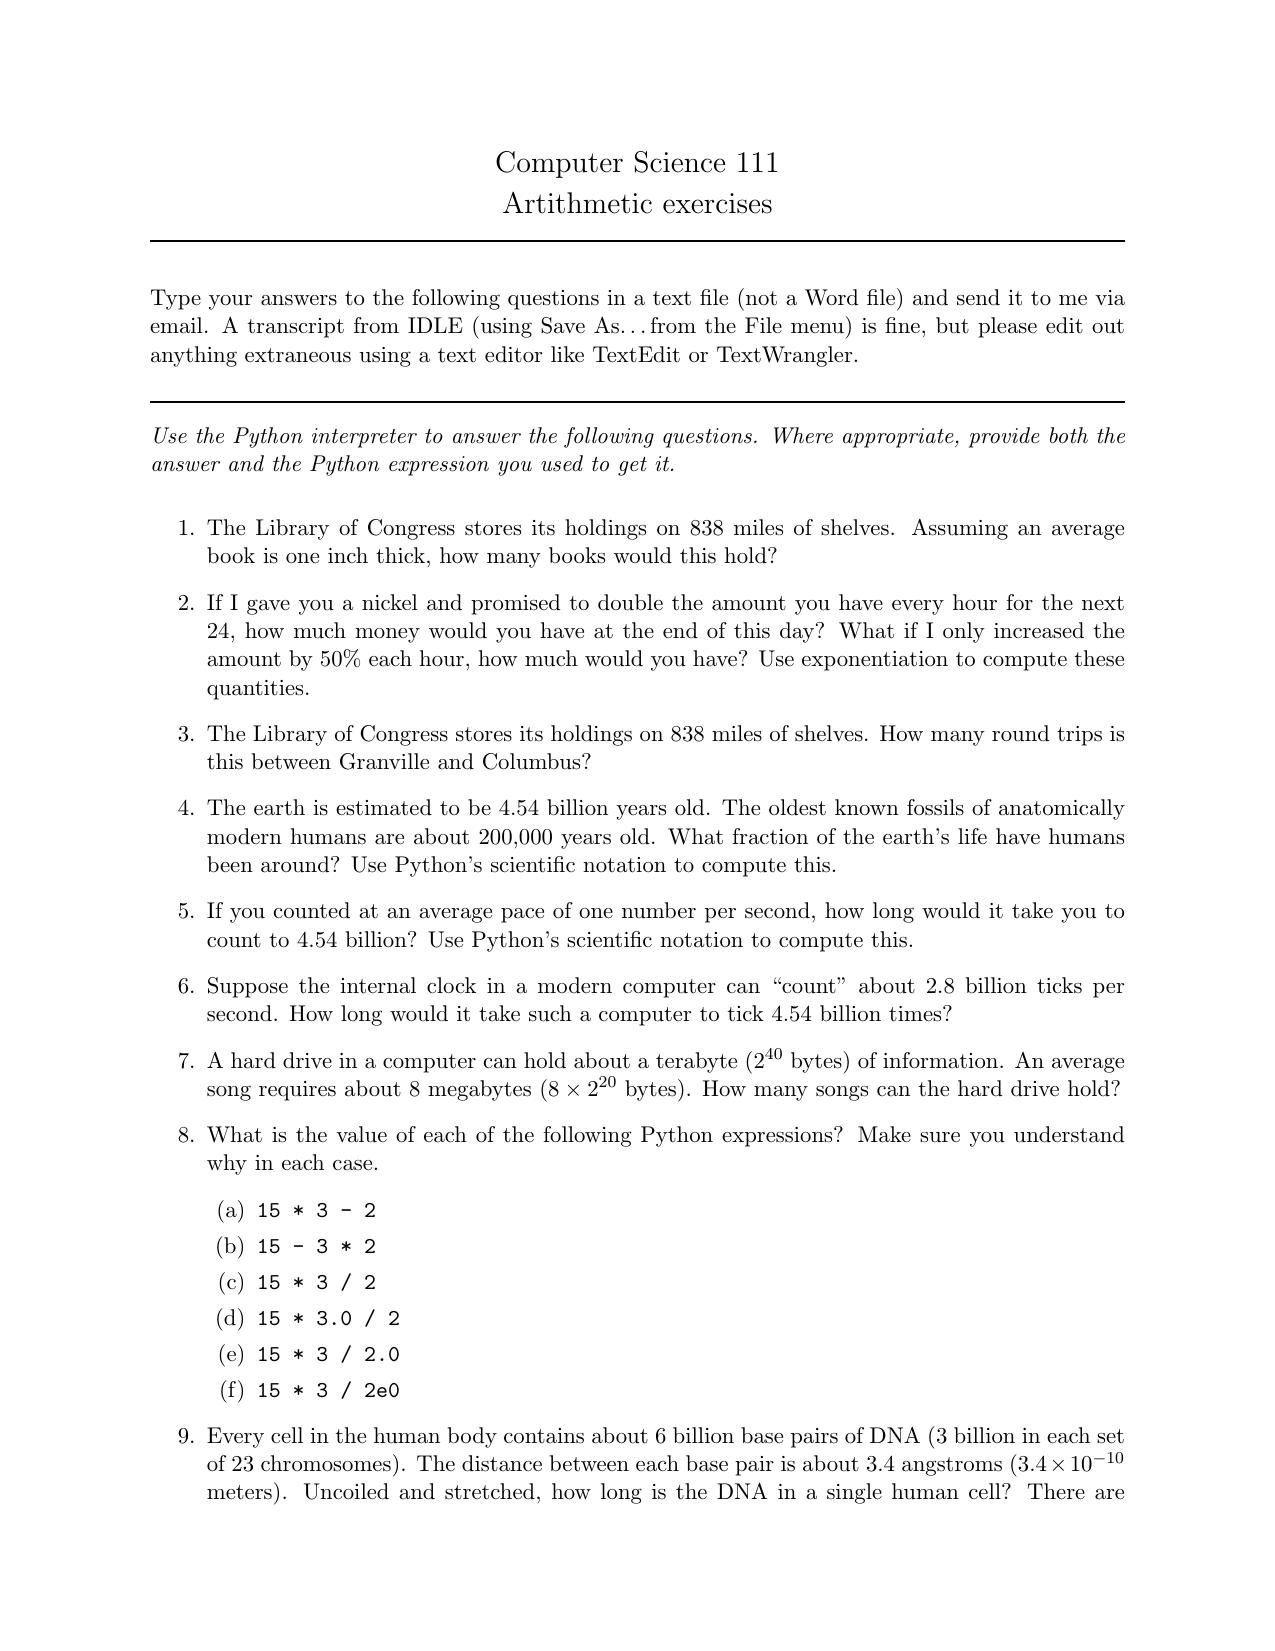 Computer Science 111 Artithmetic exercises